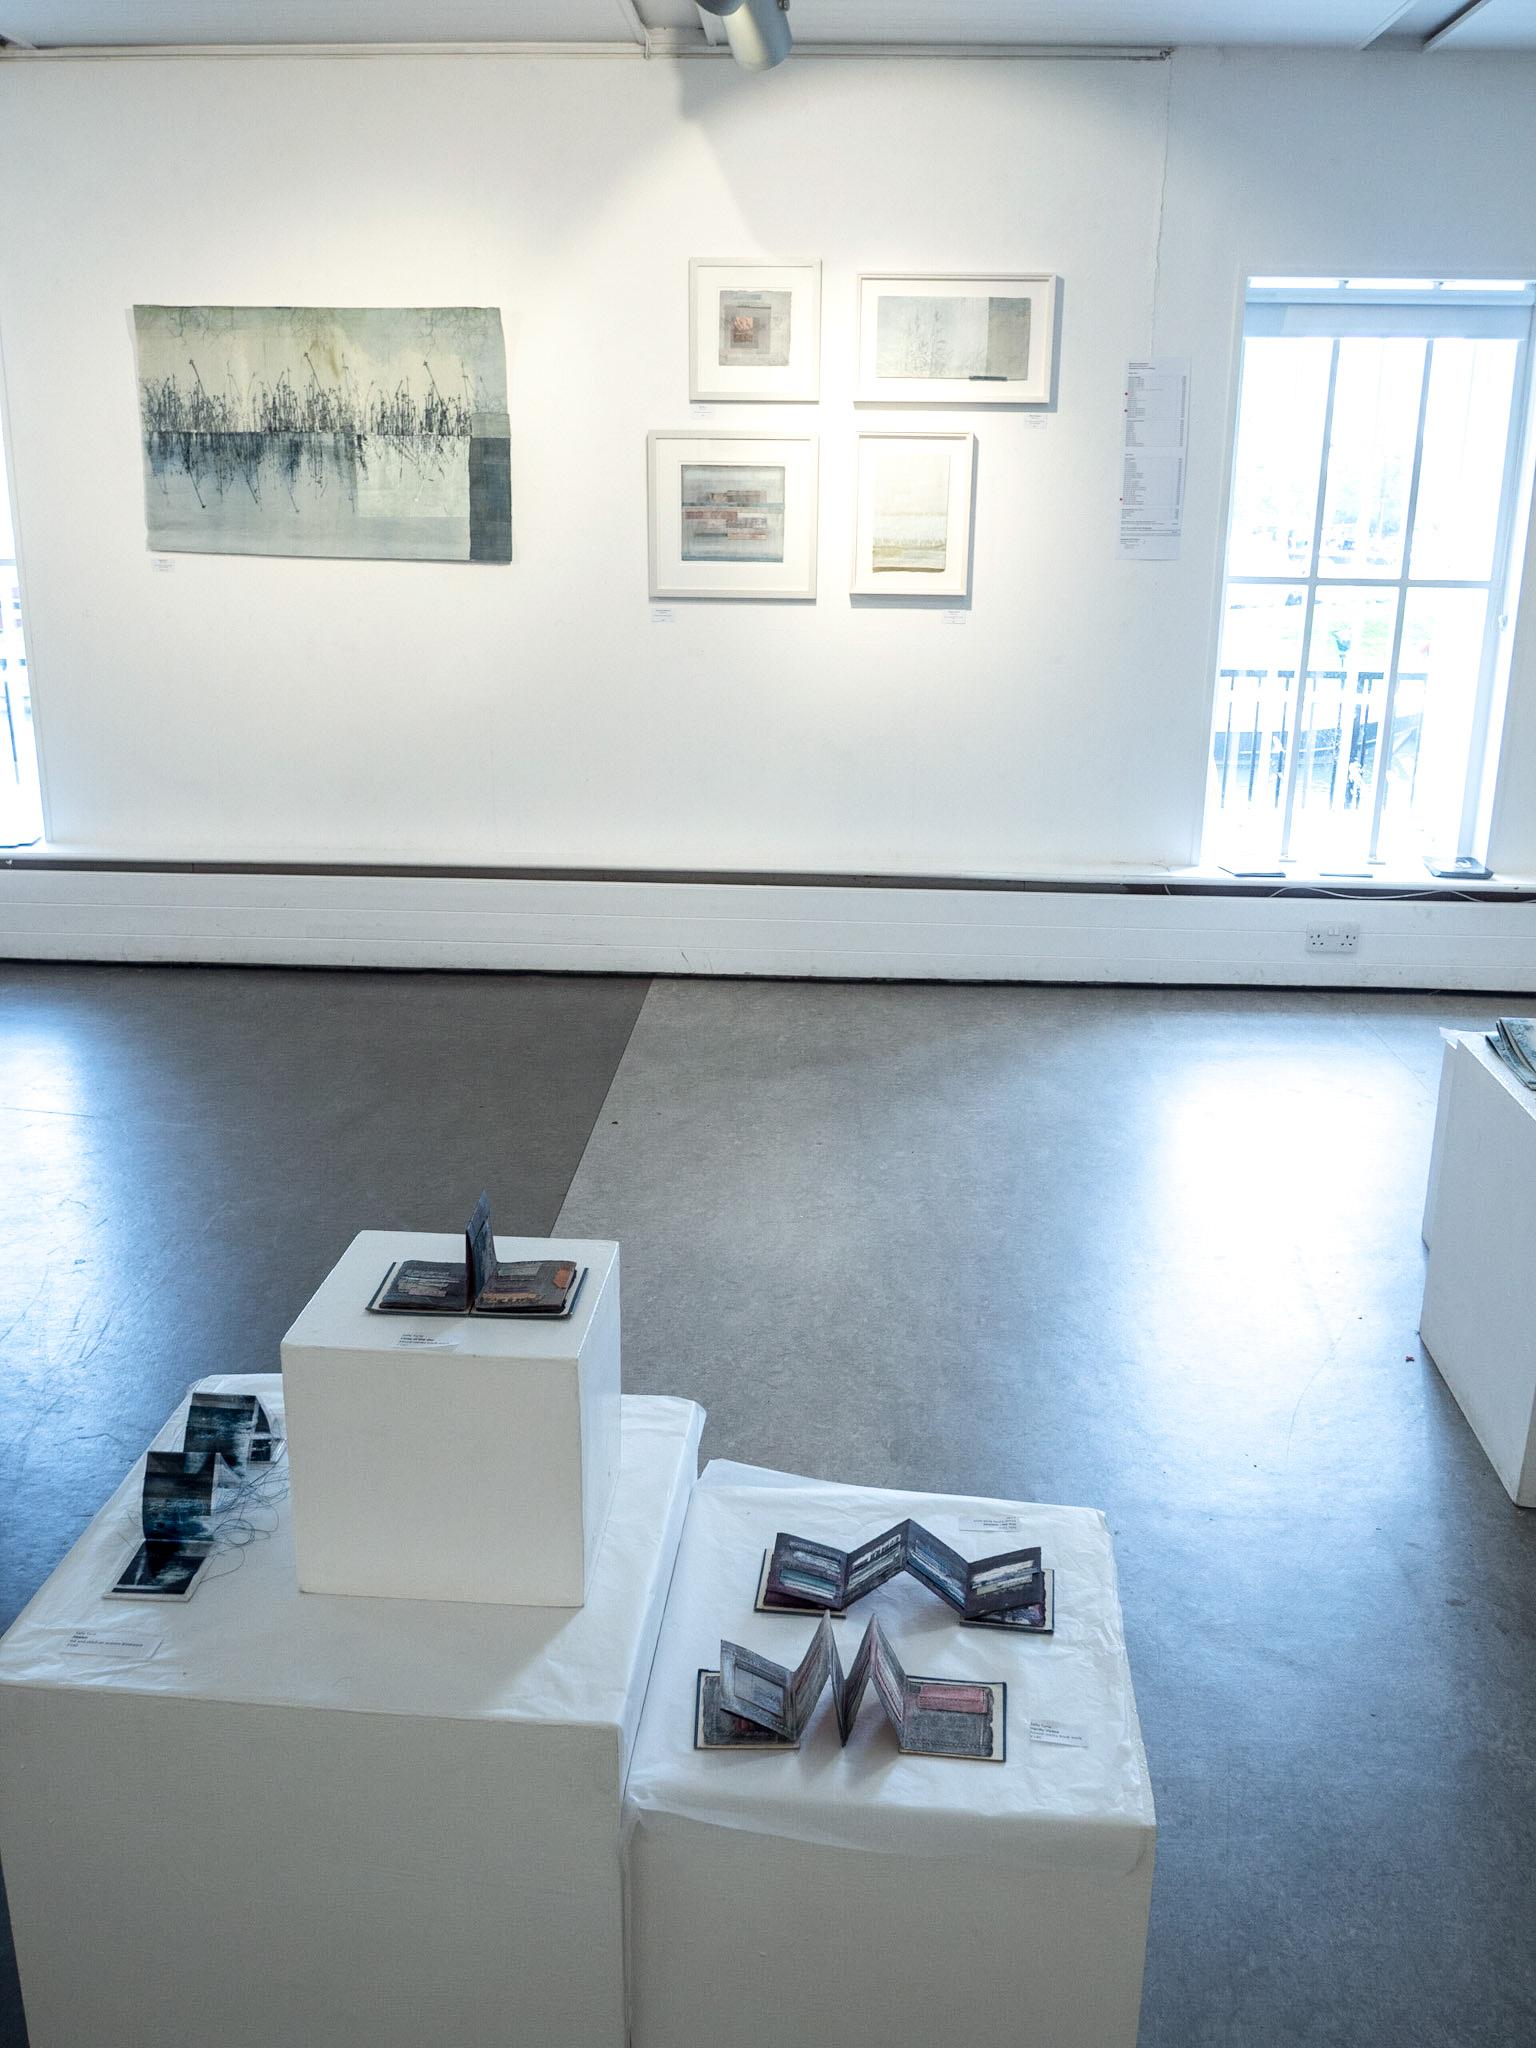 Babylon Gallery, Waterside, Ely April 2018